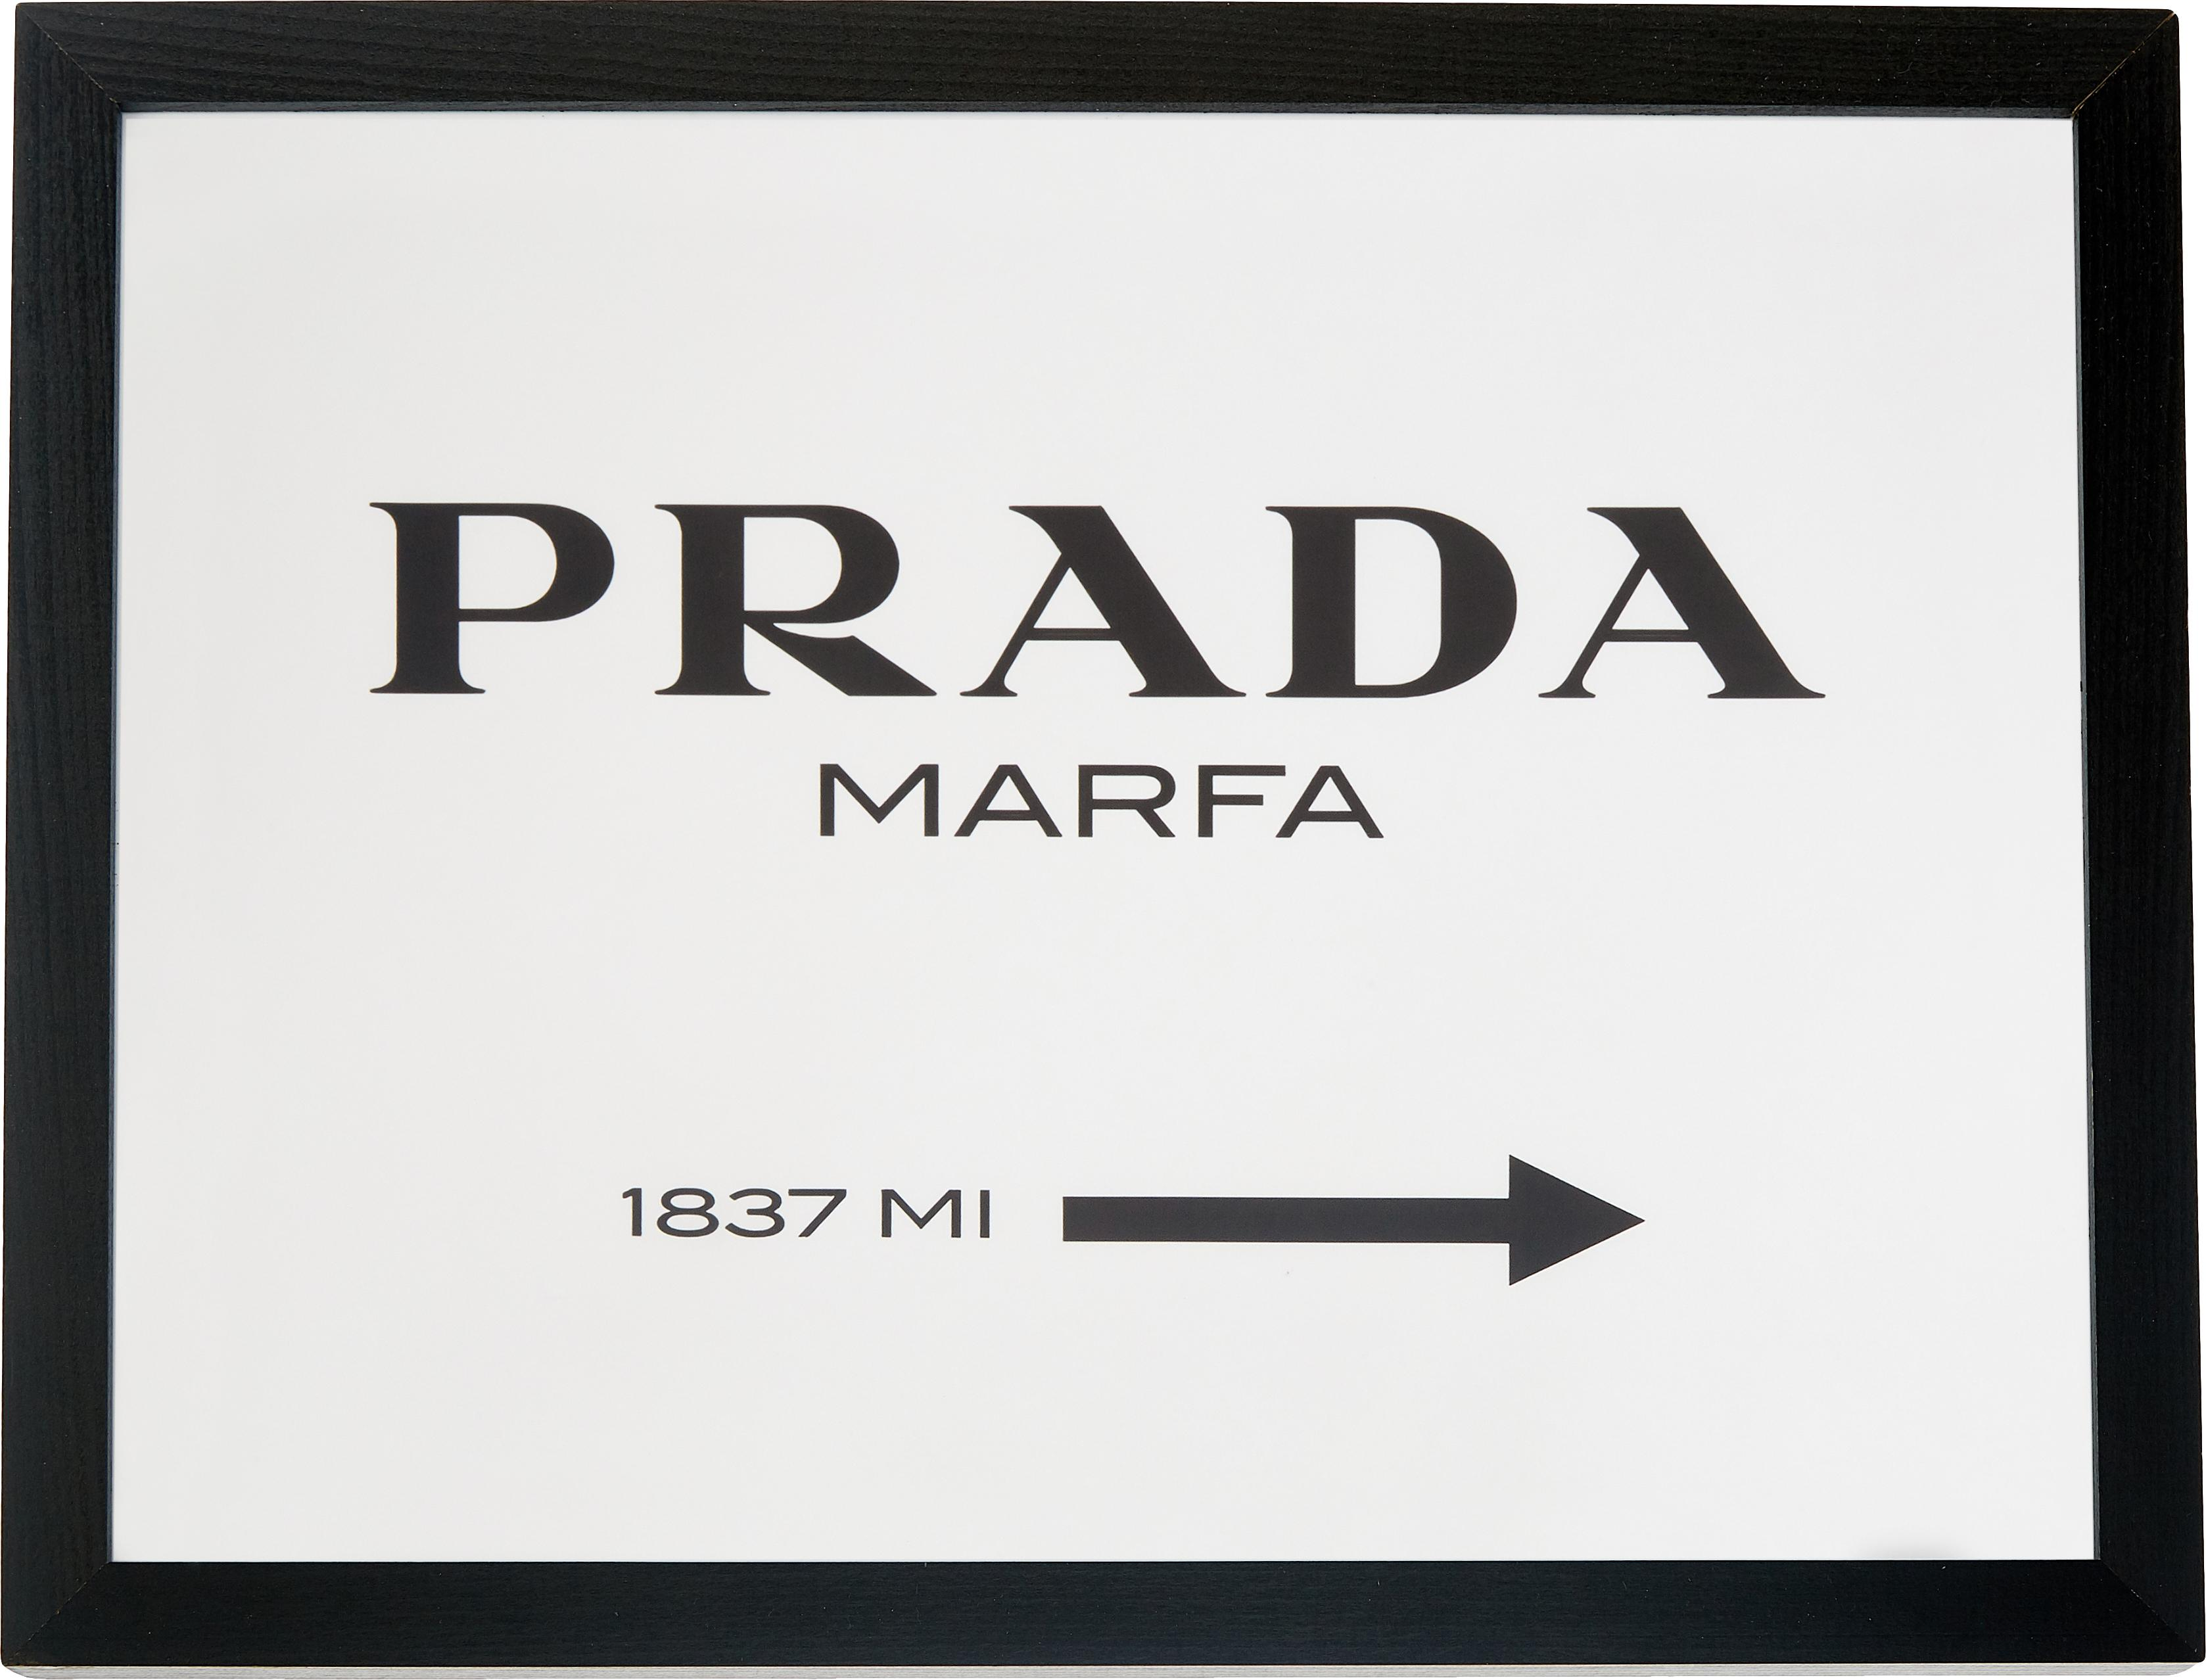 Impresión digital enmarcada Prada Marfa, Negro, blanco, An 43 x Al 33 cm